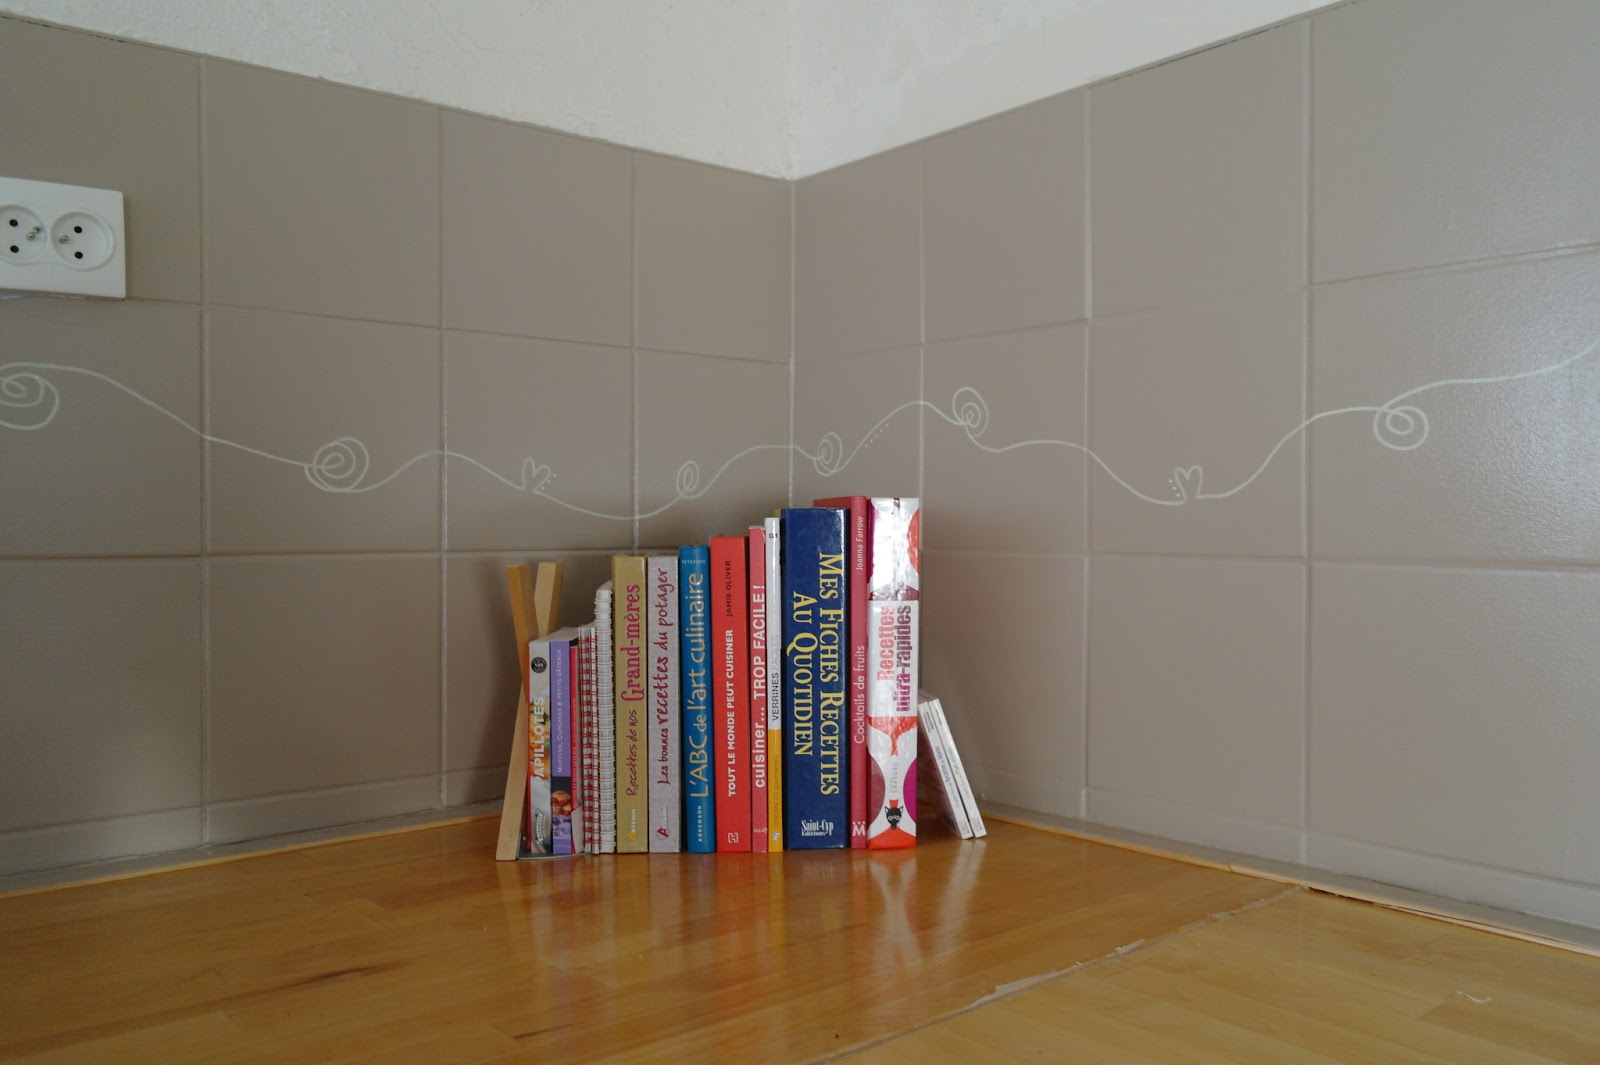 Carrelage imitation beton cire leroy merlin renovation prix m2 amiens sai - Beton cire leroy merlin prix ...